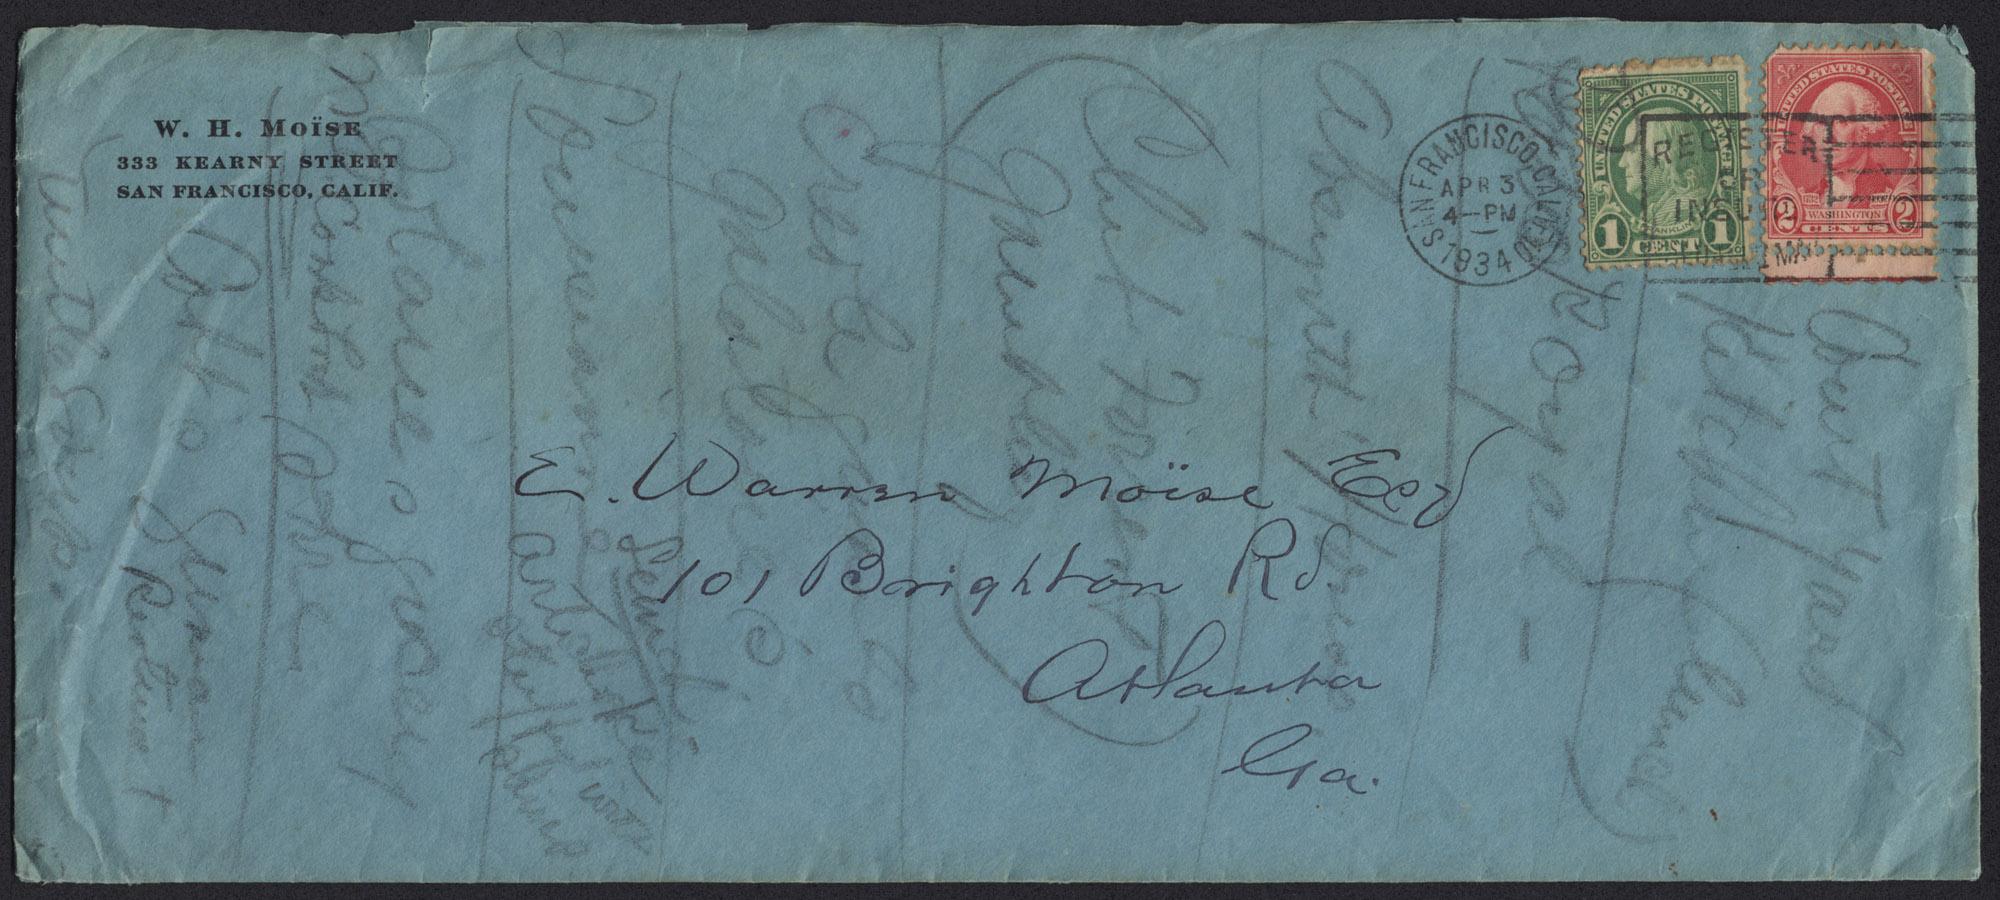 Envelope from Warren Hubert's Letter, Front